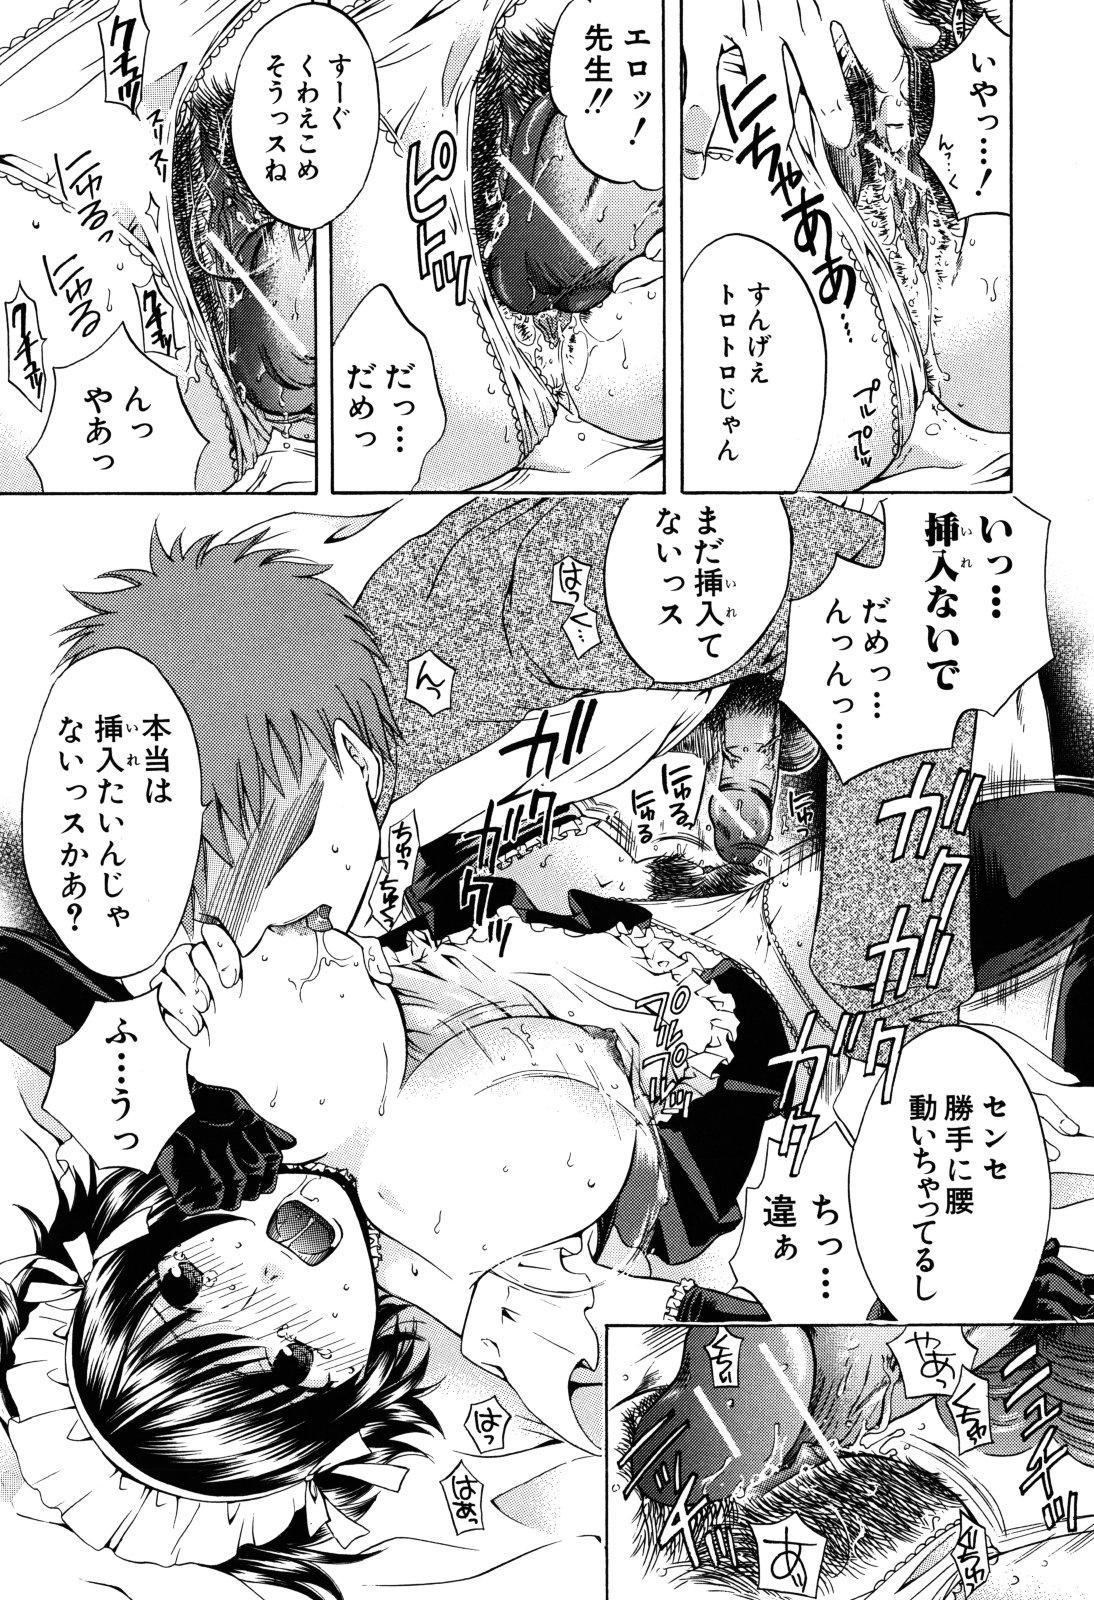 Kanojo ga Ochiru made - She in the depth 108